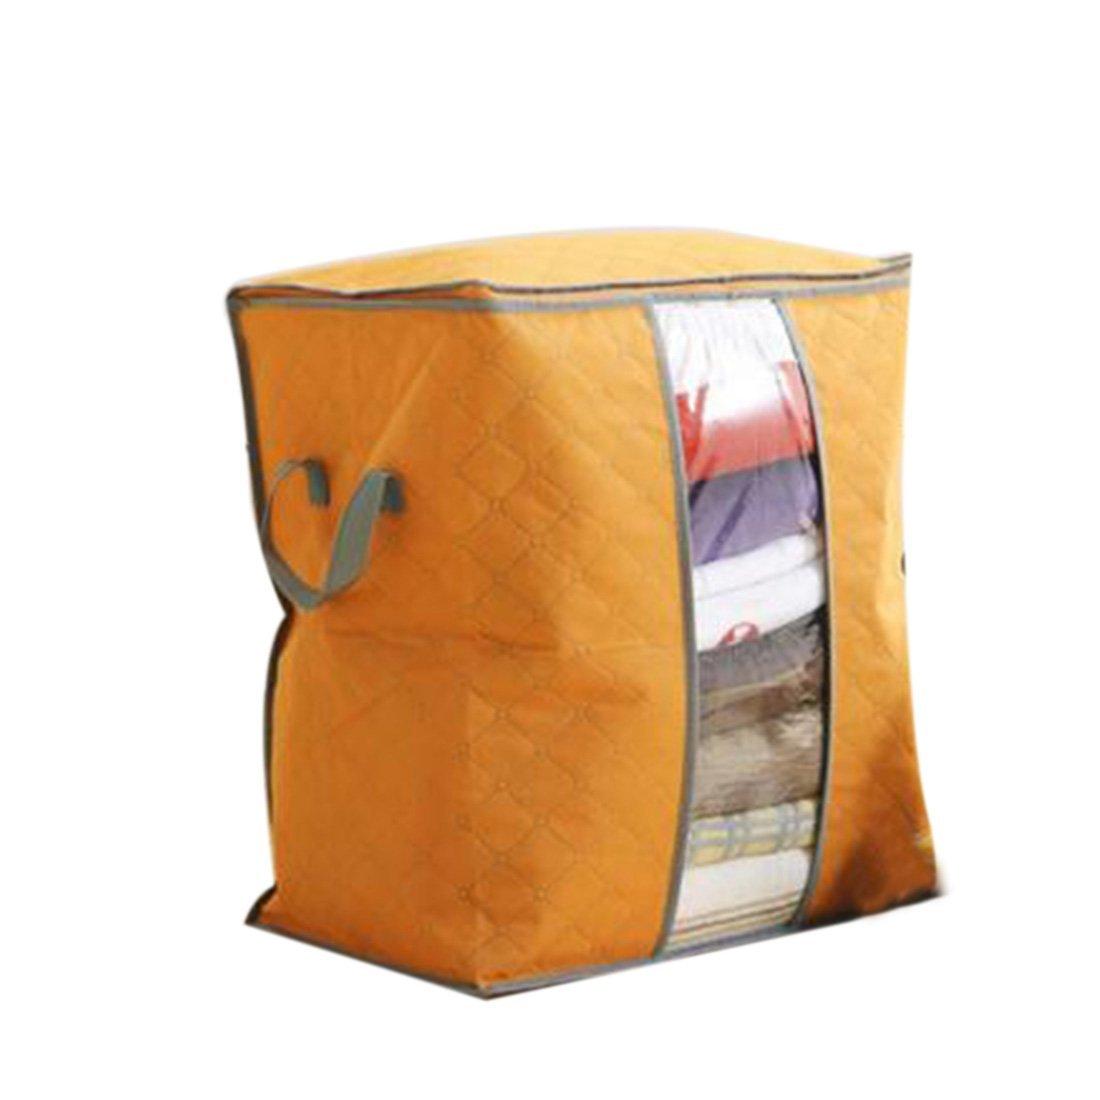 2016 Hot Sale Storage Bag Box Portable Organizer Non Woven Underbed Pouch Storage Box Bamboo Clothing Storage Bag